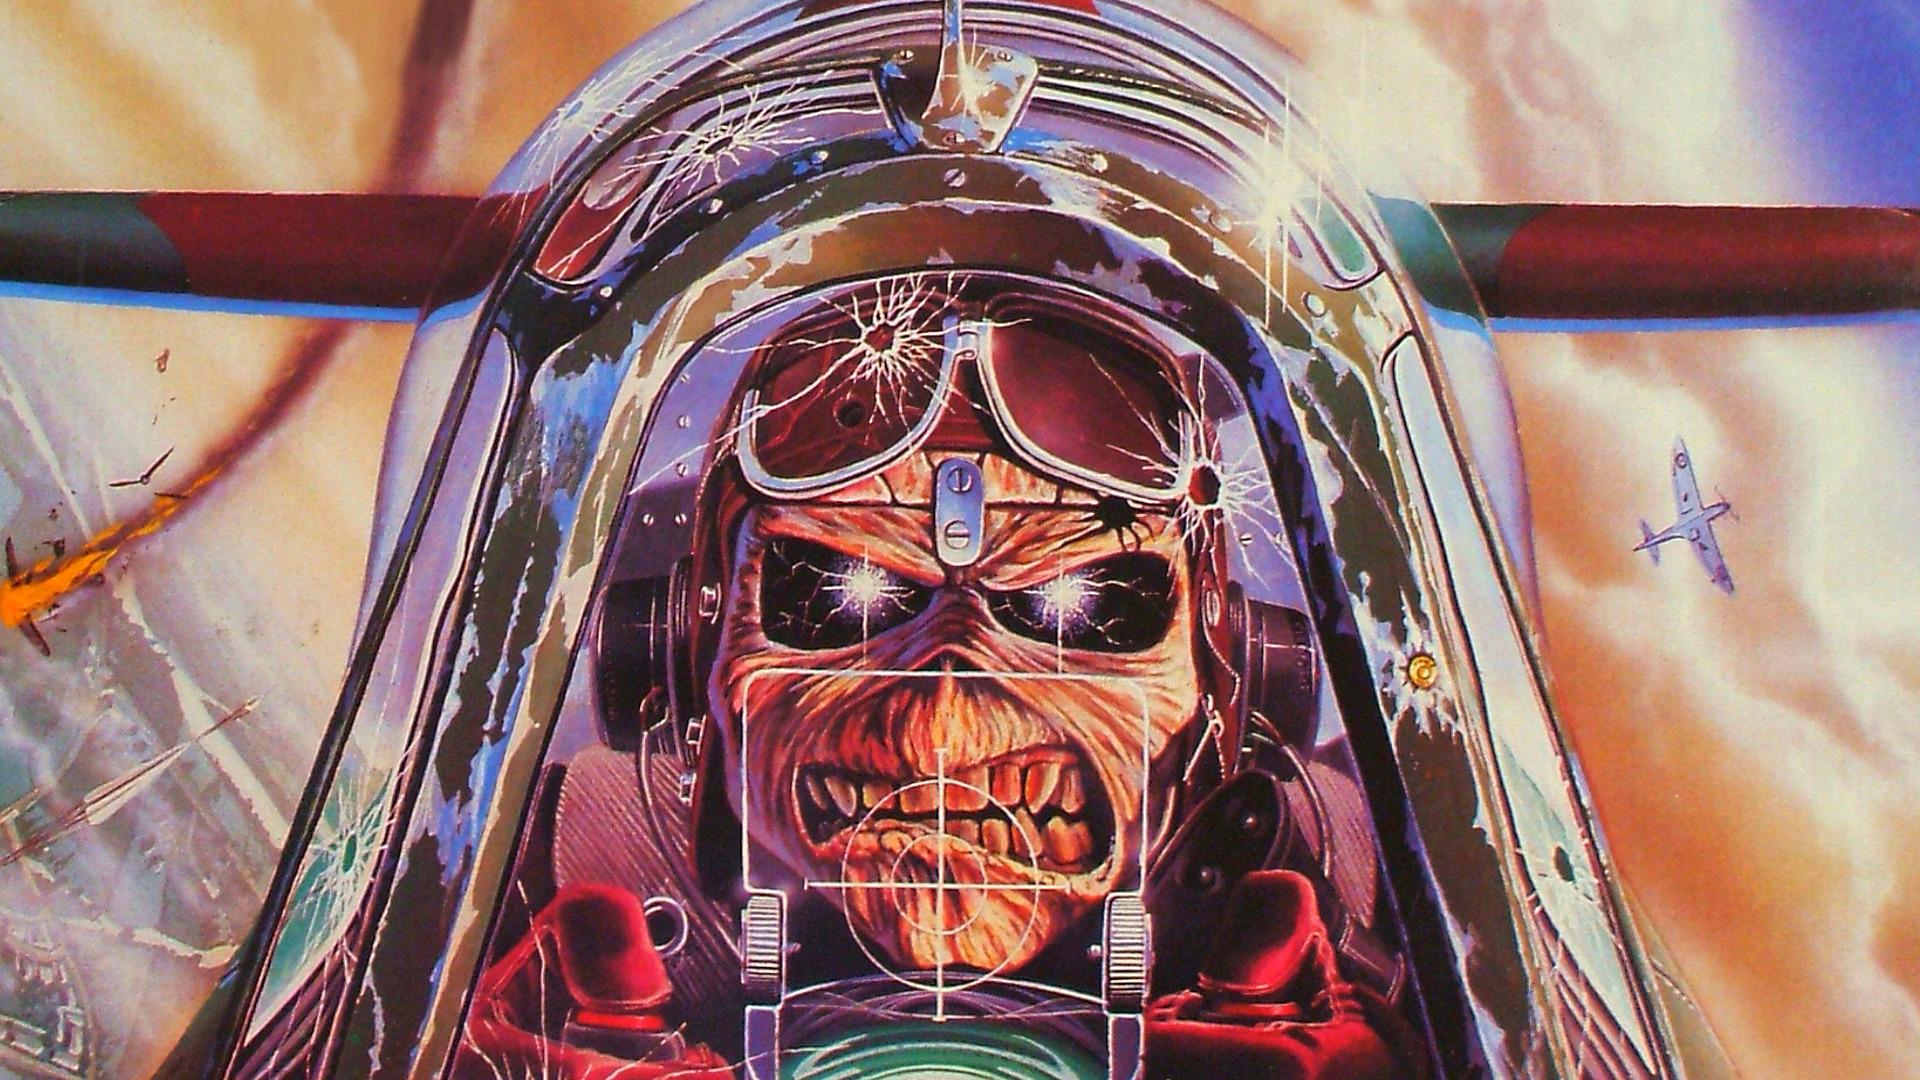 Iron Maiden Wallpaper 1920x1080 - WallpaperSafari